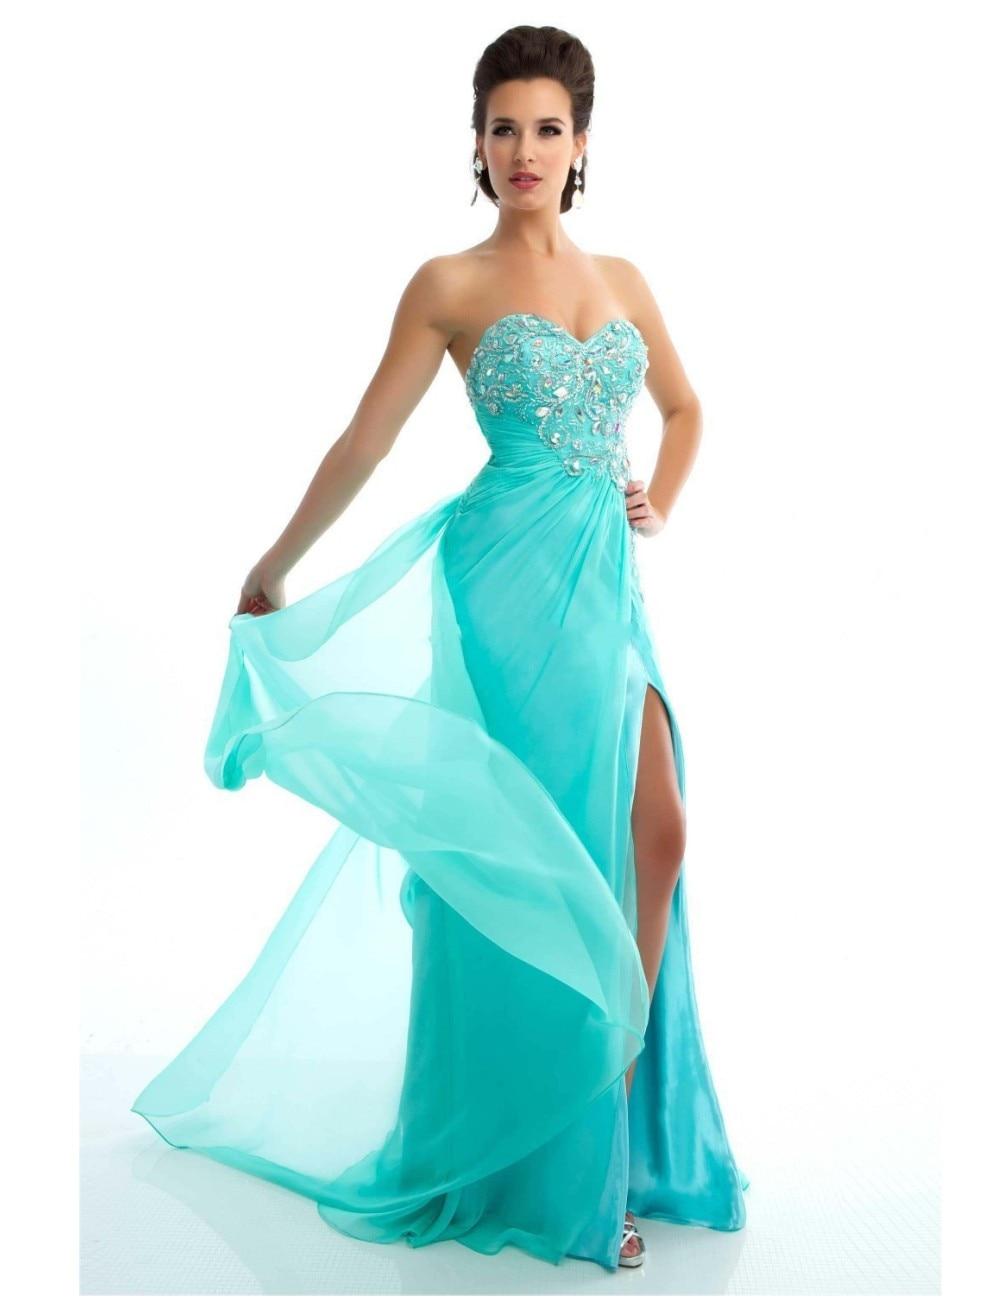 Sexy High Side Slit Beaded Crystal Chiffon Prom Dresses Formal Women ...